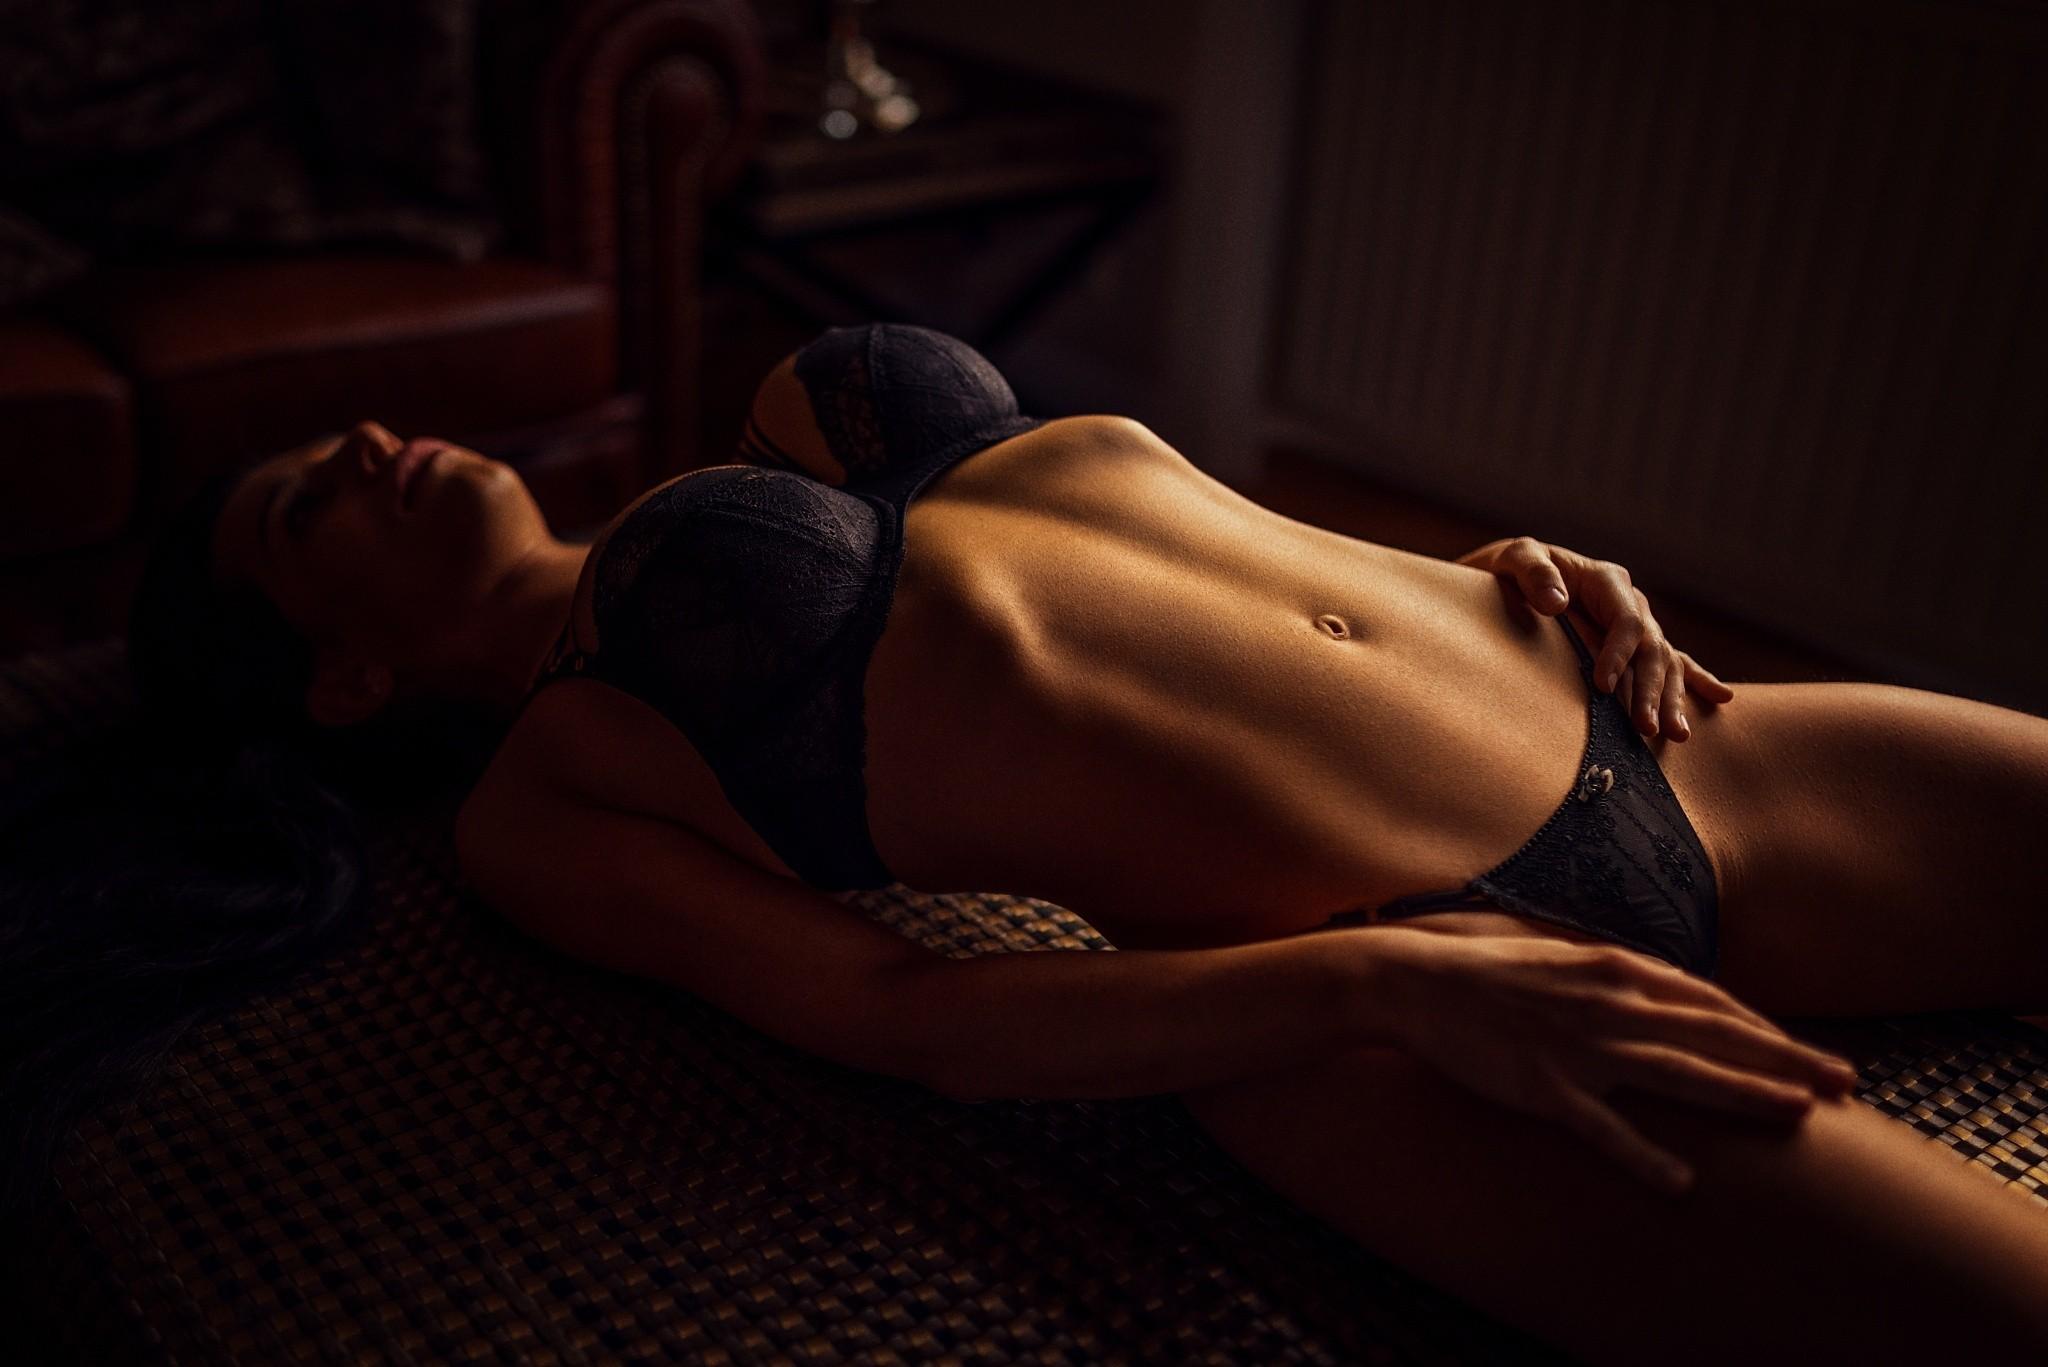 поза на животе женские картинки порошок бадяги